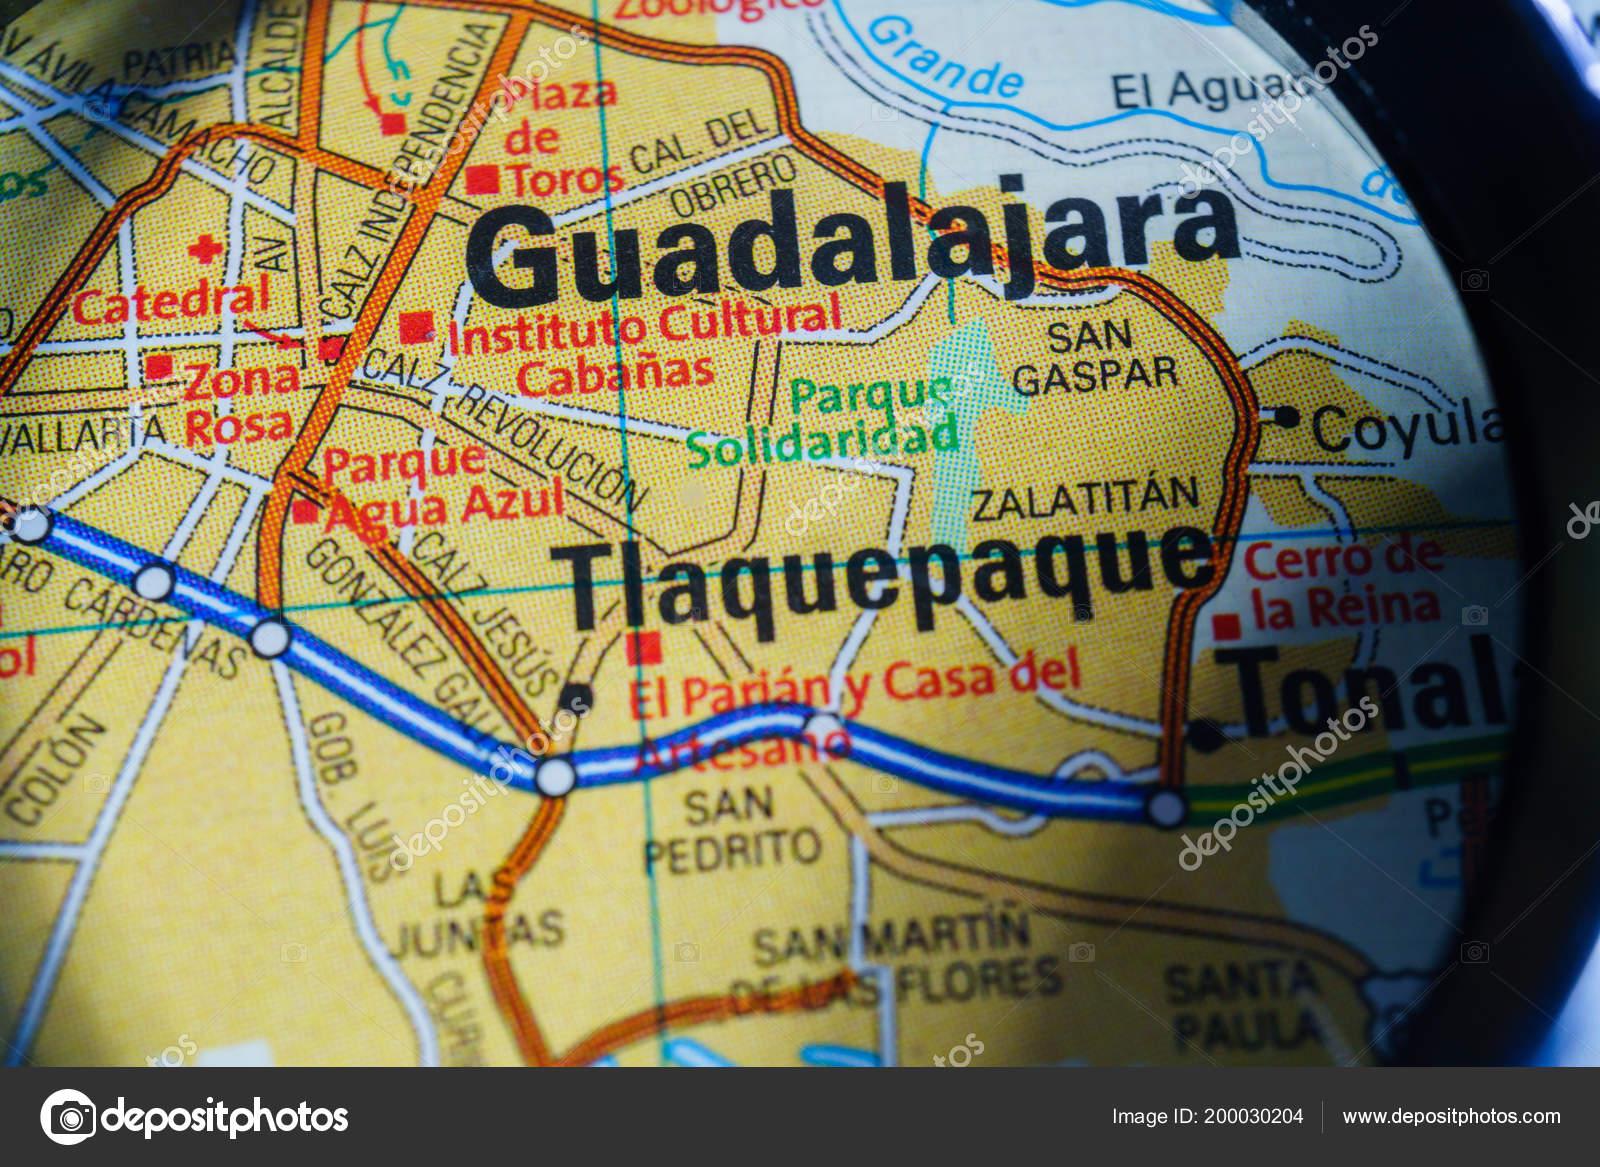 Guadalajara Mexico Mapa Foto De Stock C Aallm 200030204